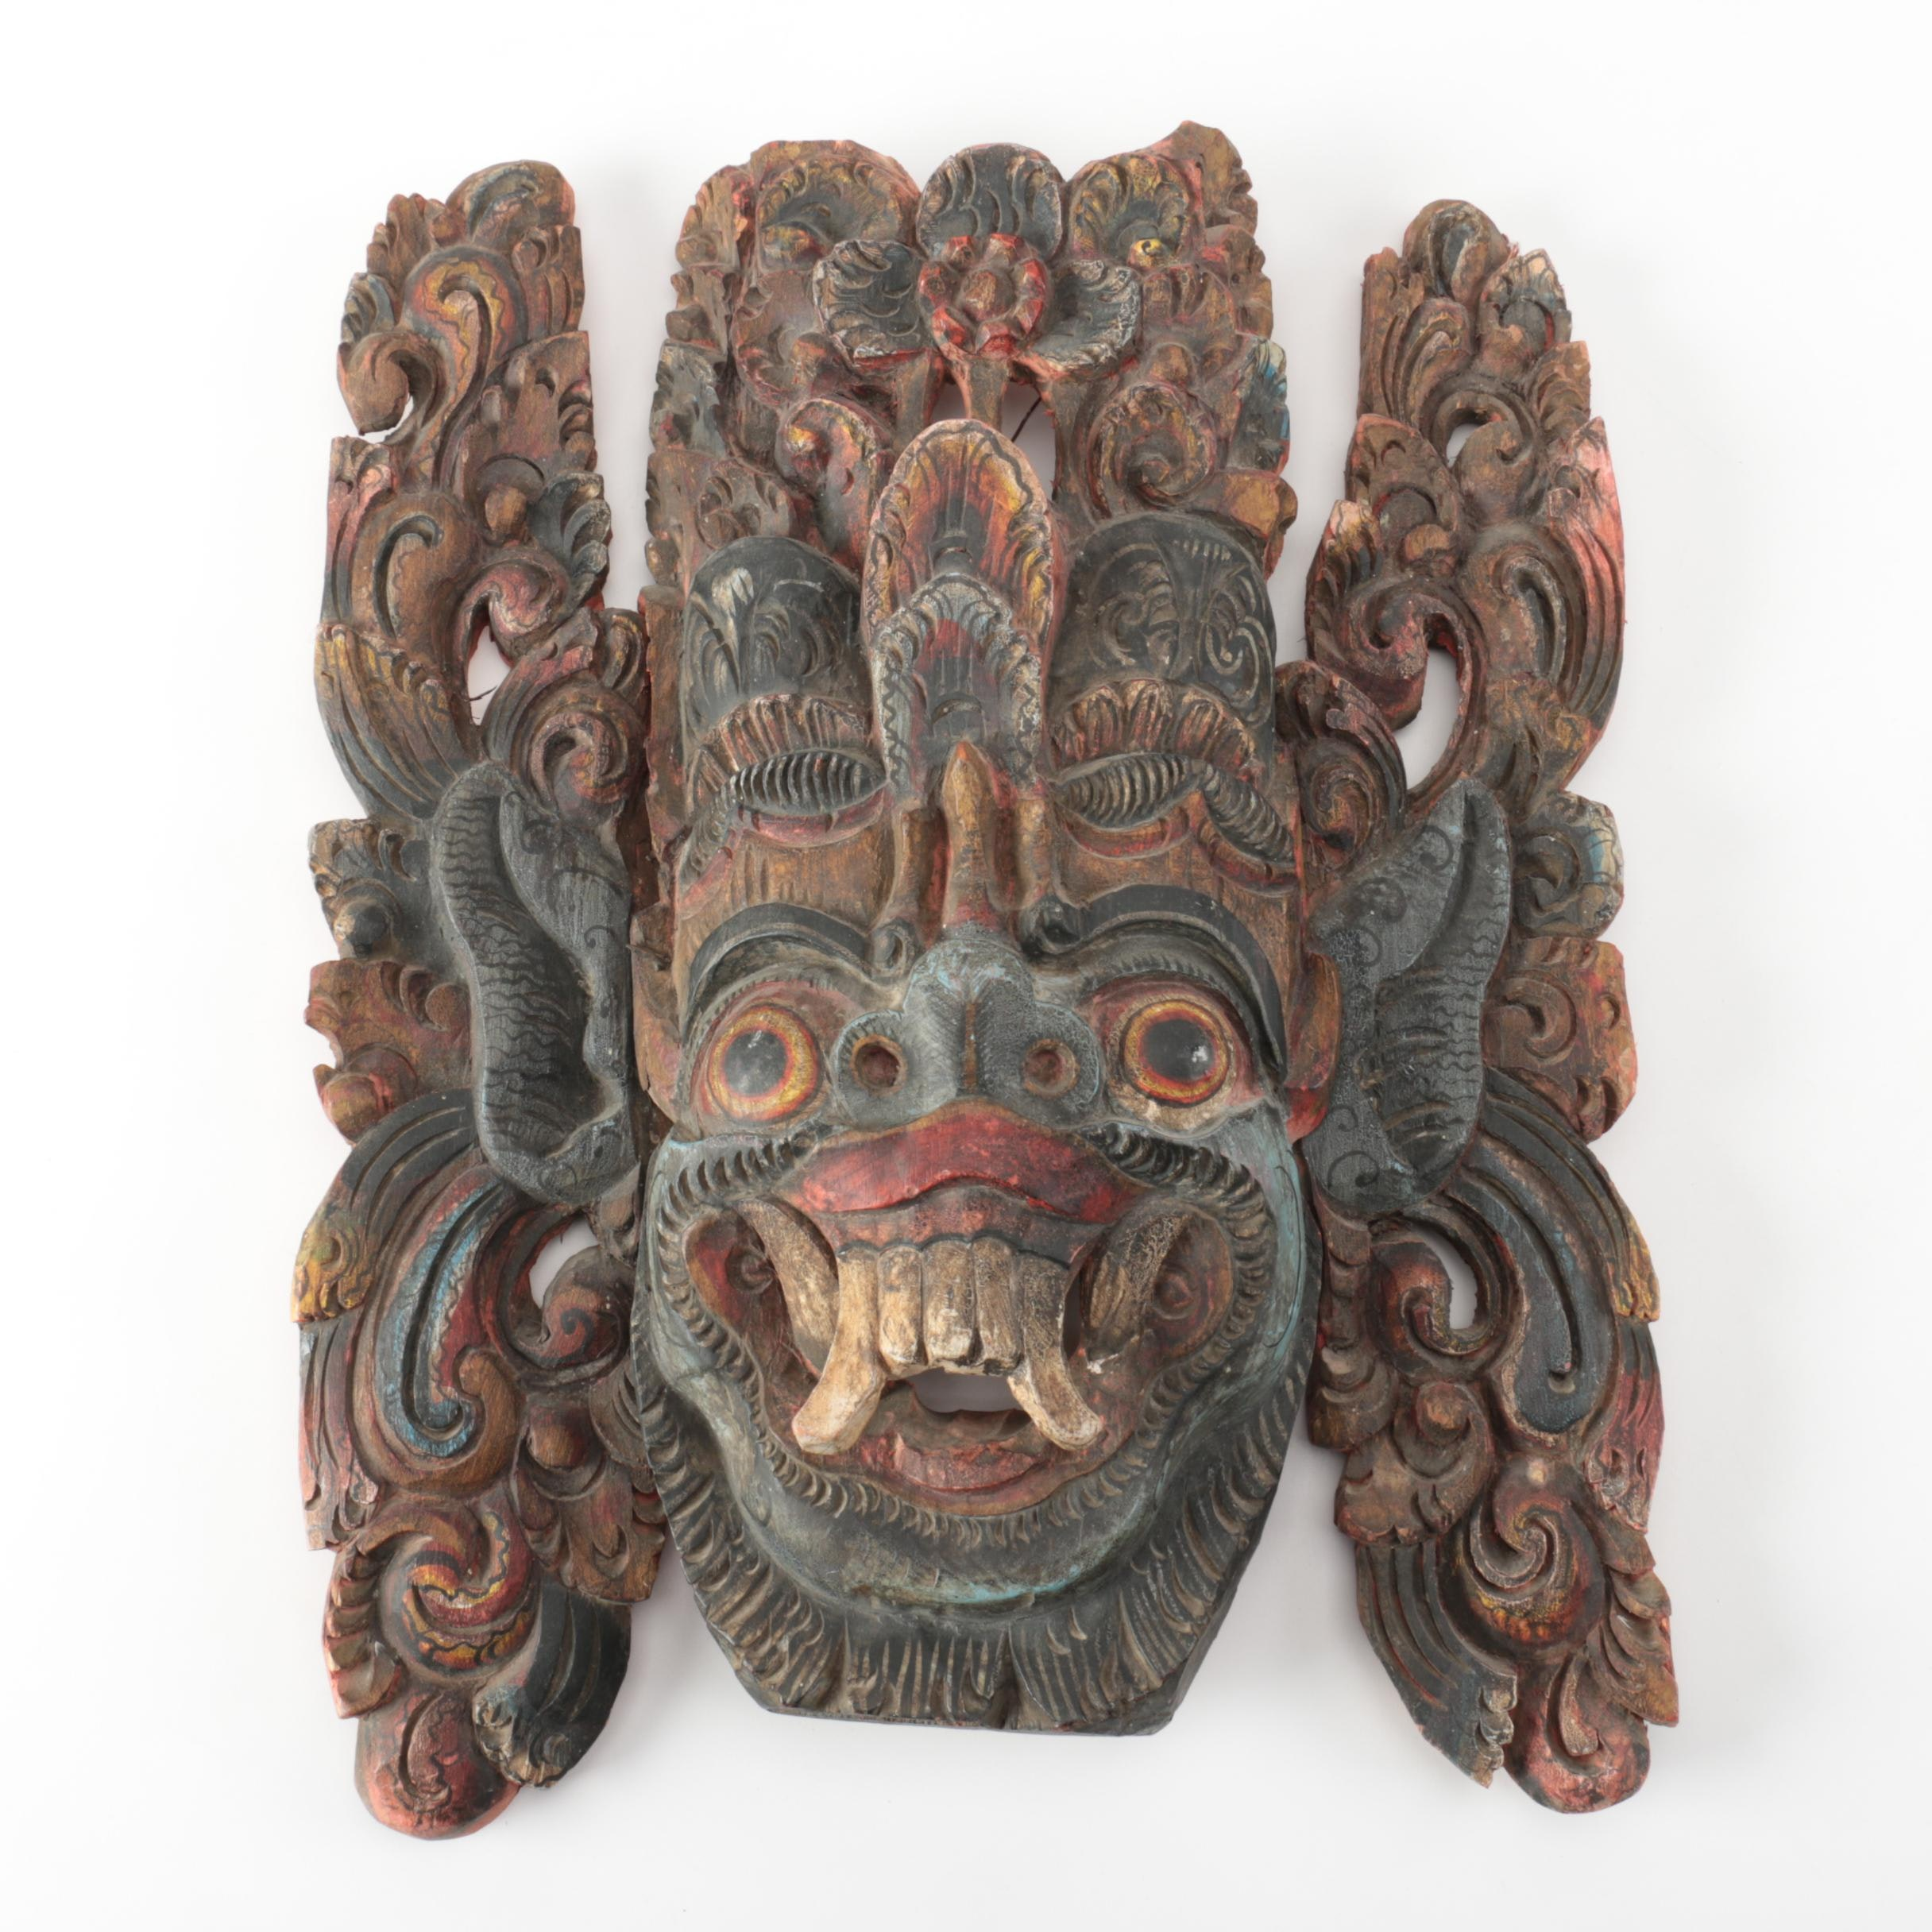 Balinese Carved Wood Mask of Hanuman